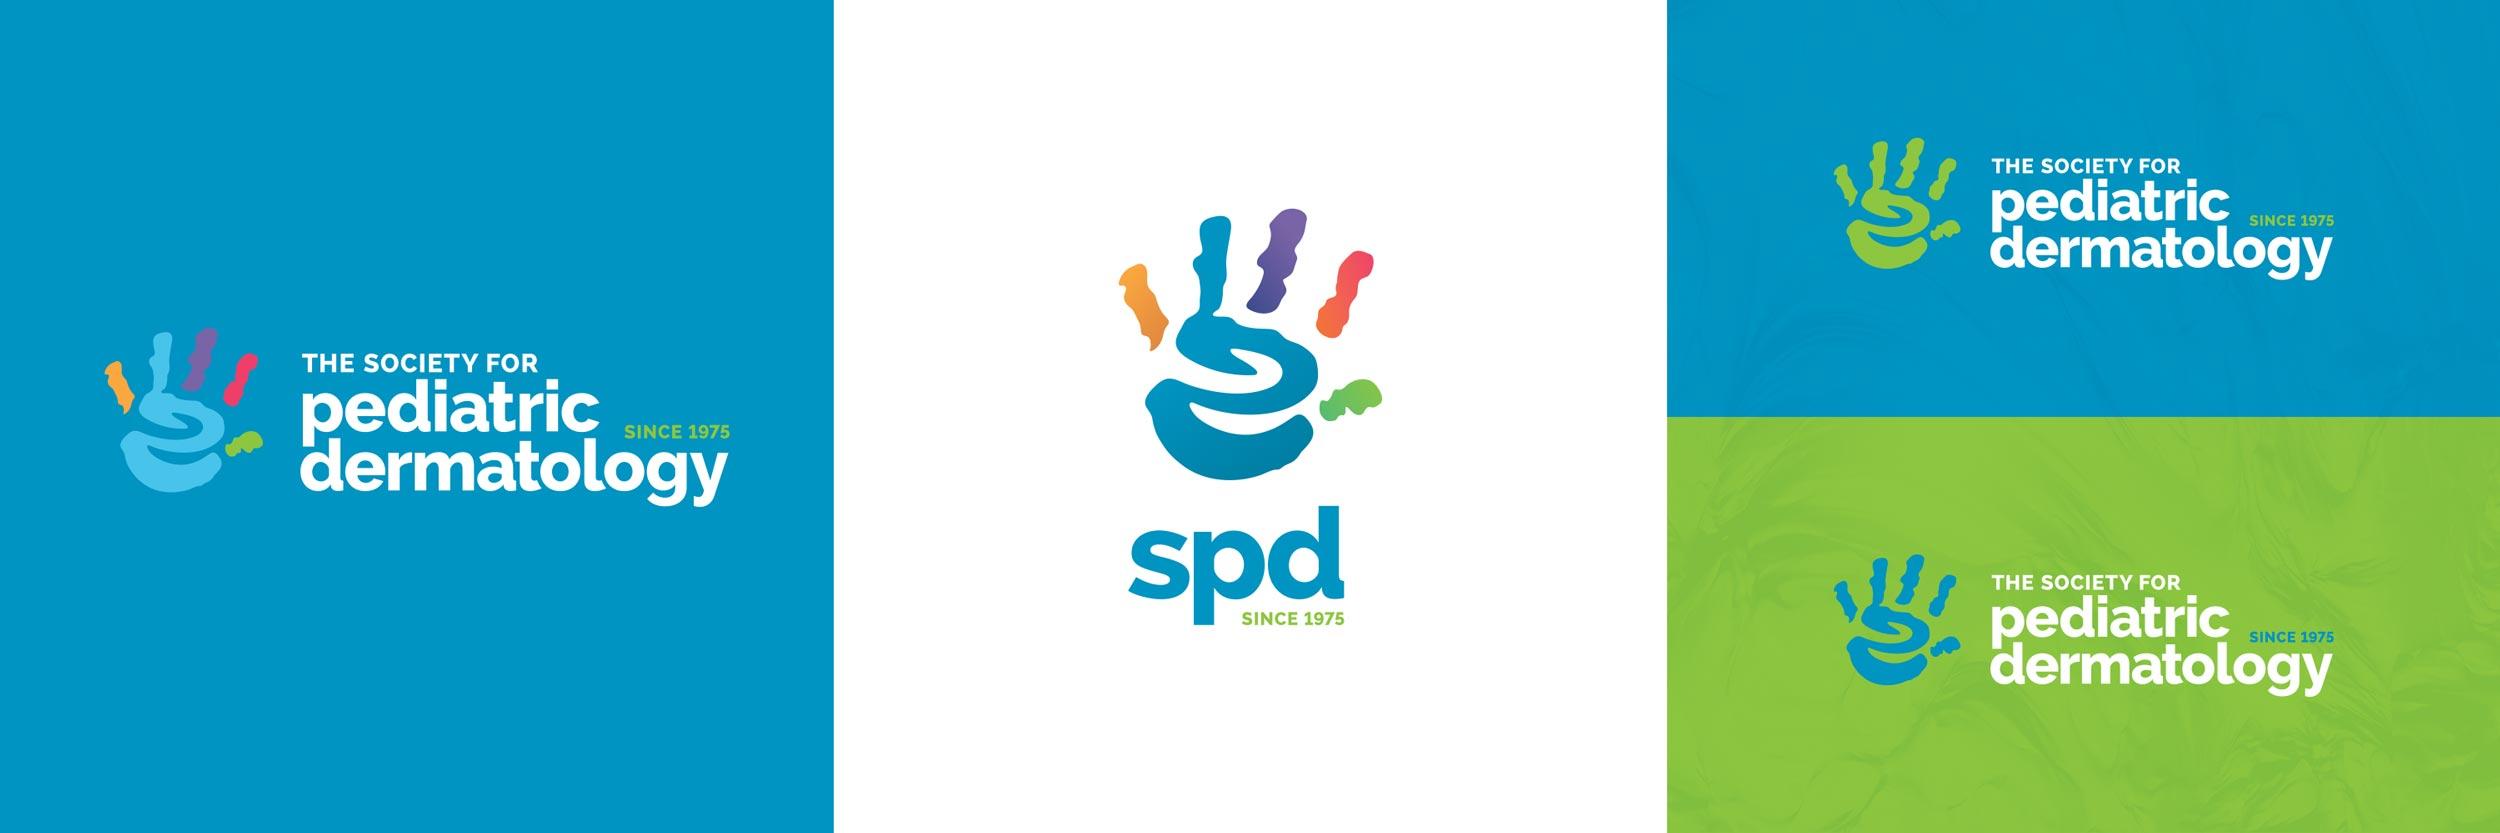 Reversed and abbreviated brandmarks for The Society of Pediatric Dermatology.Image copyright Jeff Miller, HellothisisJeff Design LLC